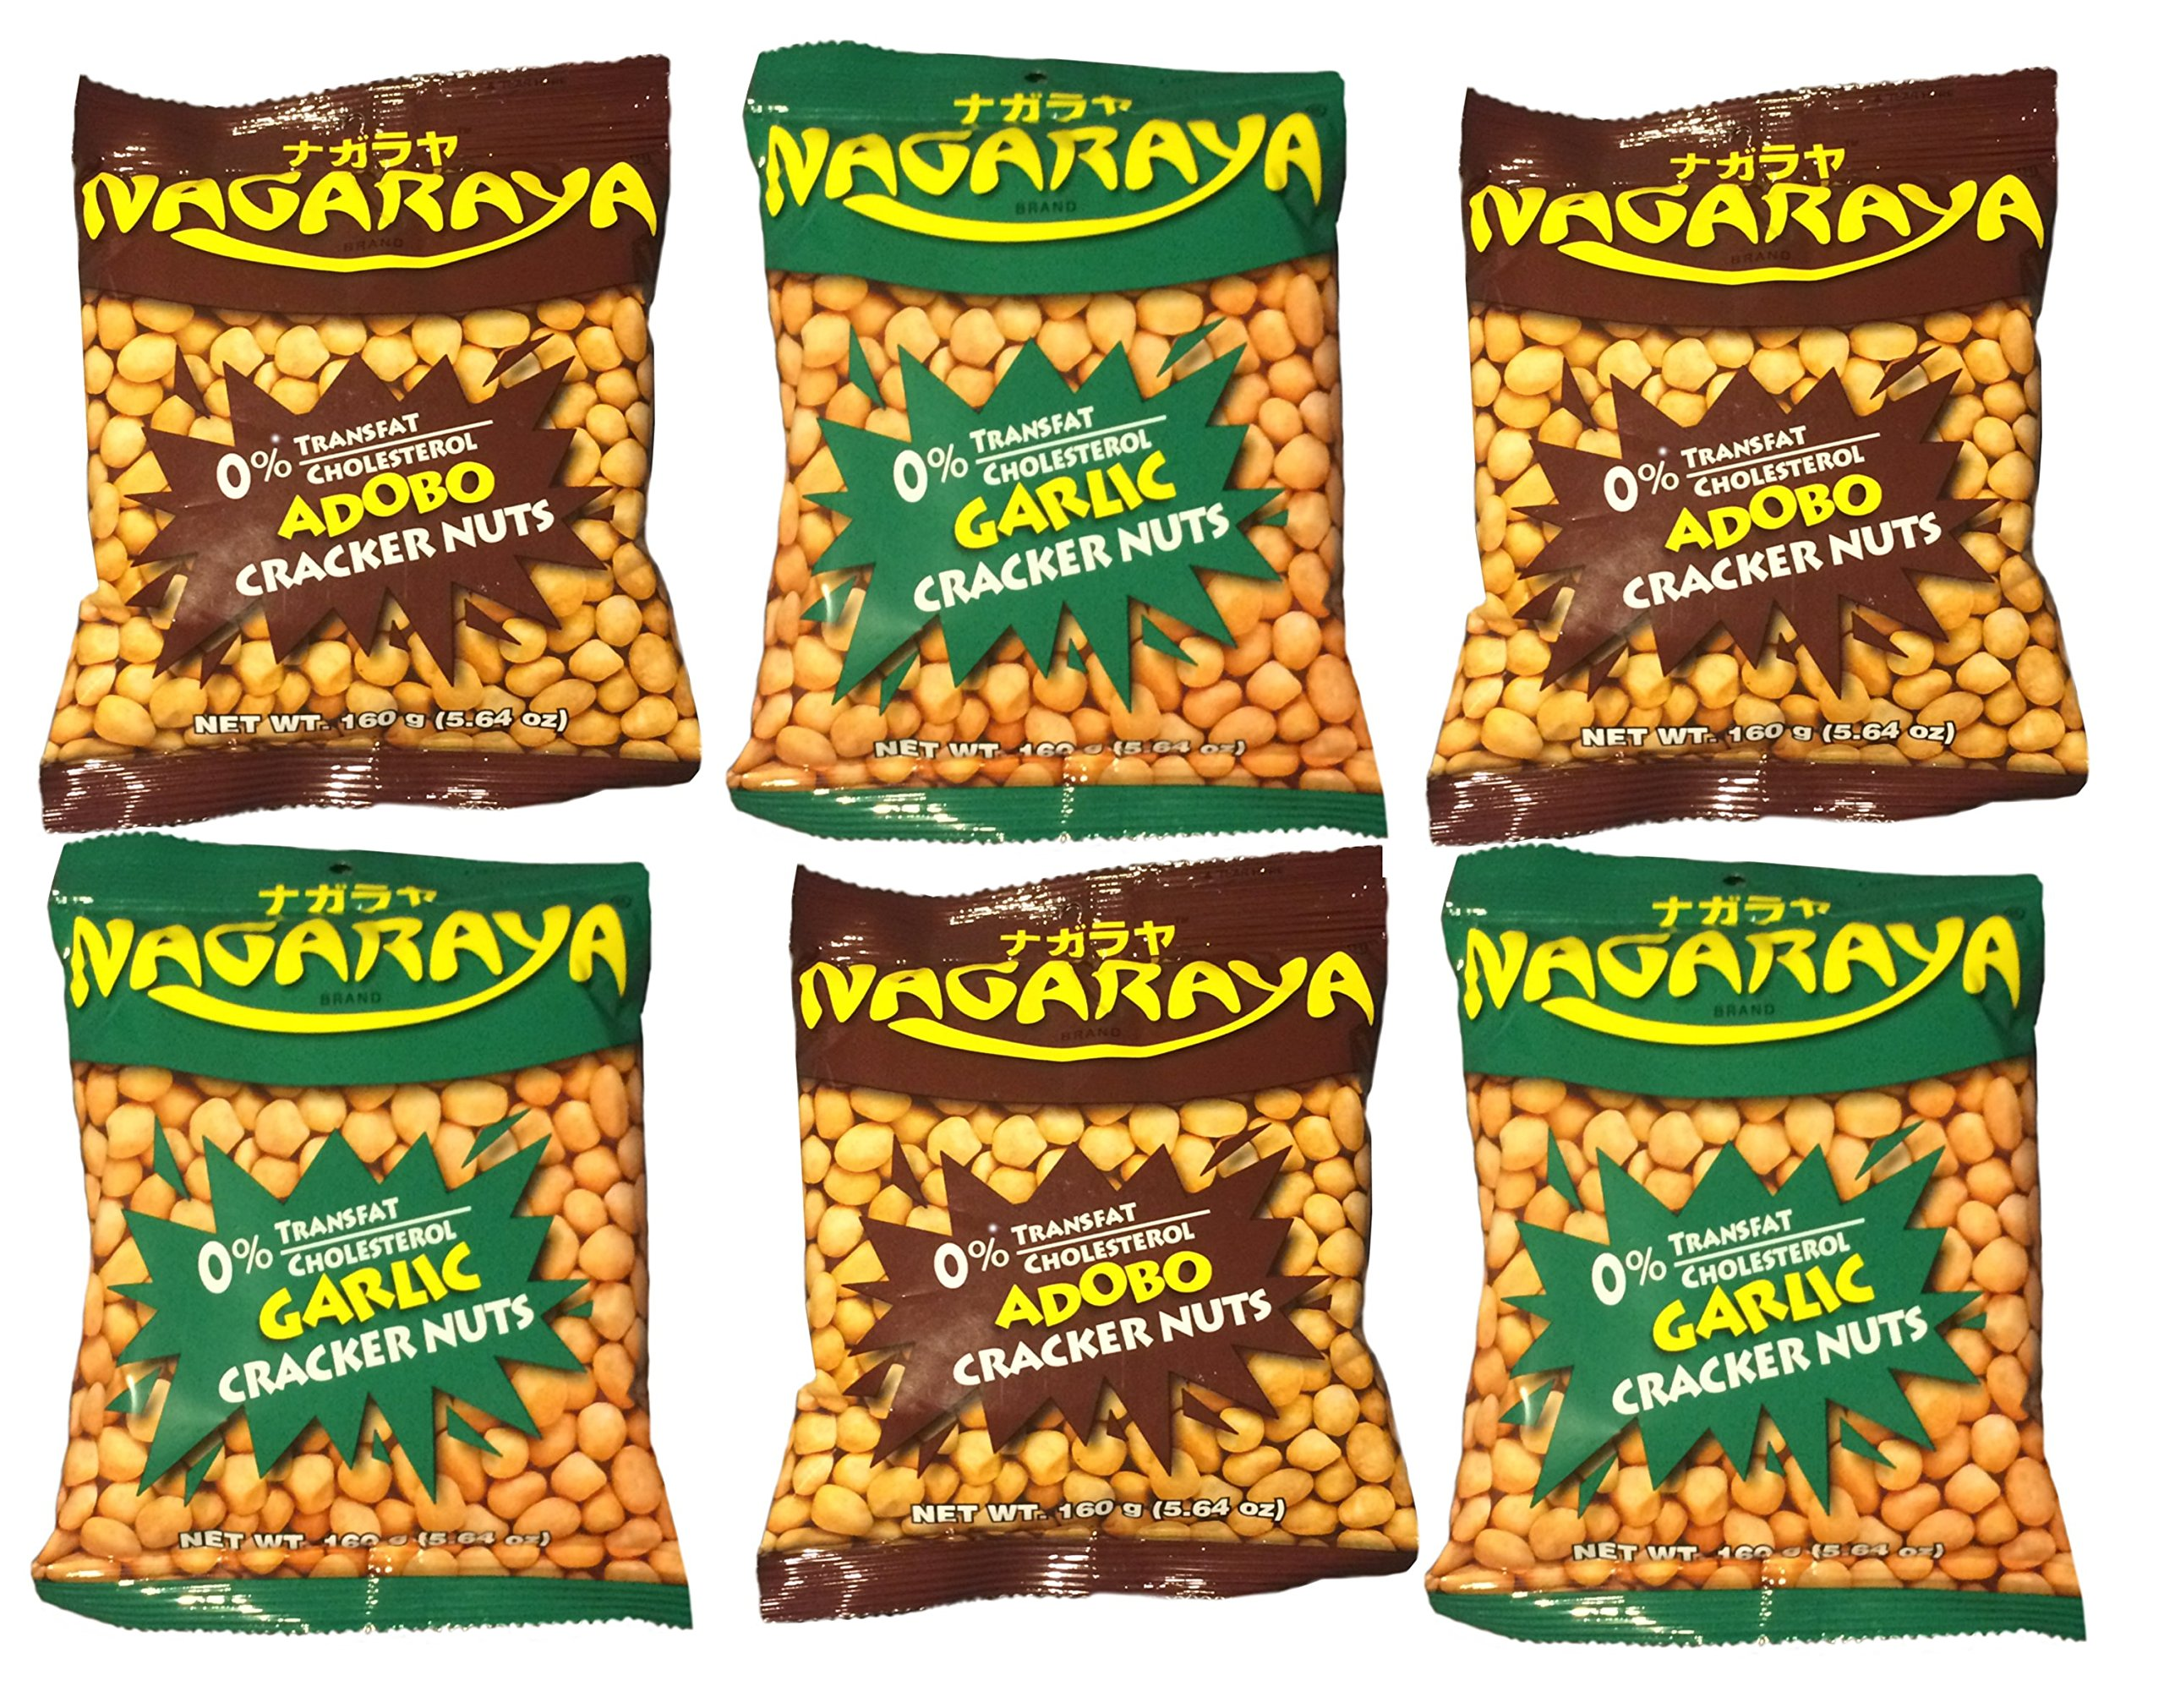 Nagaraya Adobo Cracker Nuts Bundle with Nagaraya Garlic Cracker Nuts, 3 each Flavor, 5.64 oz, 6 count